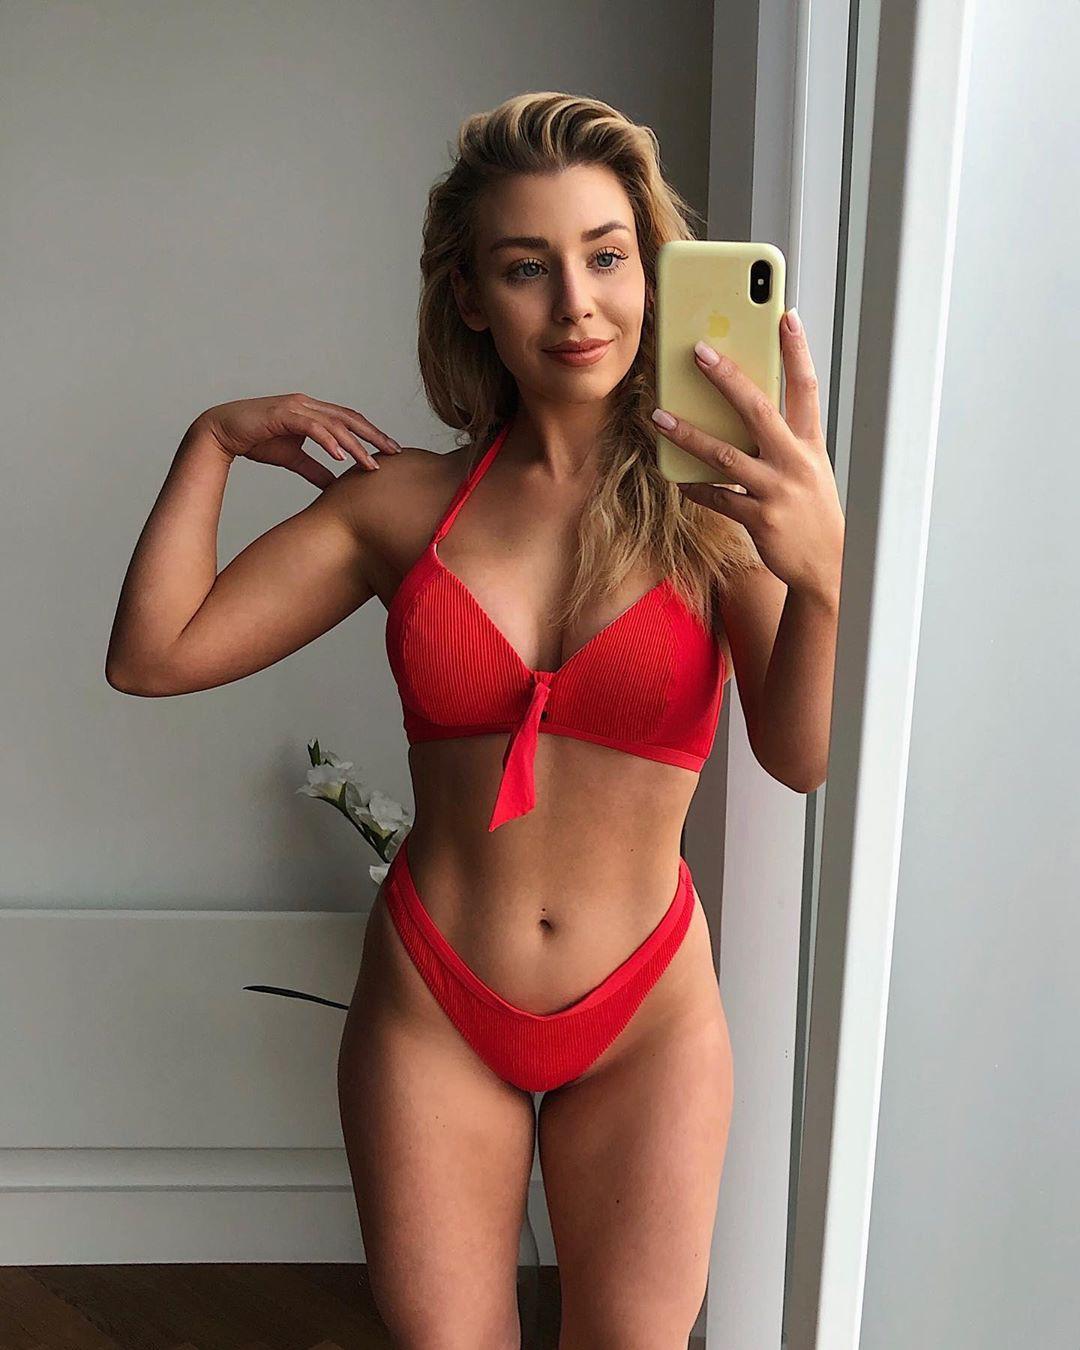 Sophie Cute Hot Girls On The Insta, latest lingerie photo, bikini ideas swimwear outfit ideas